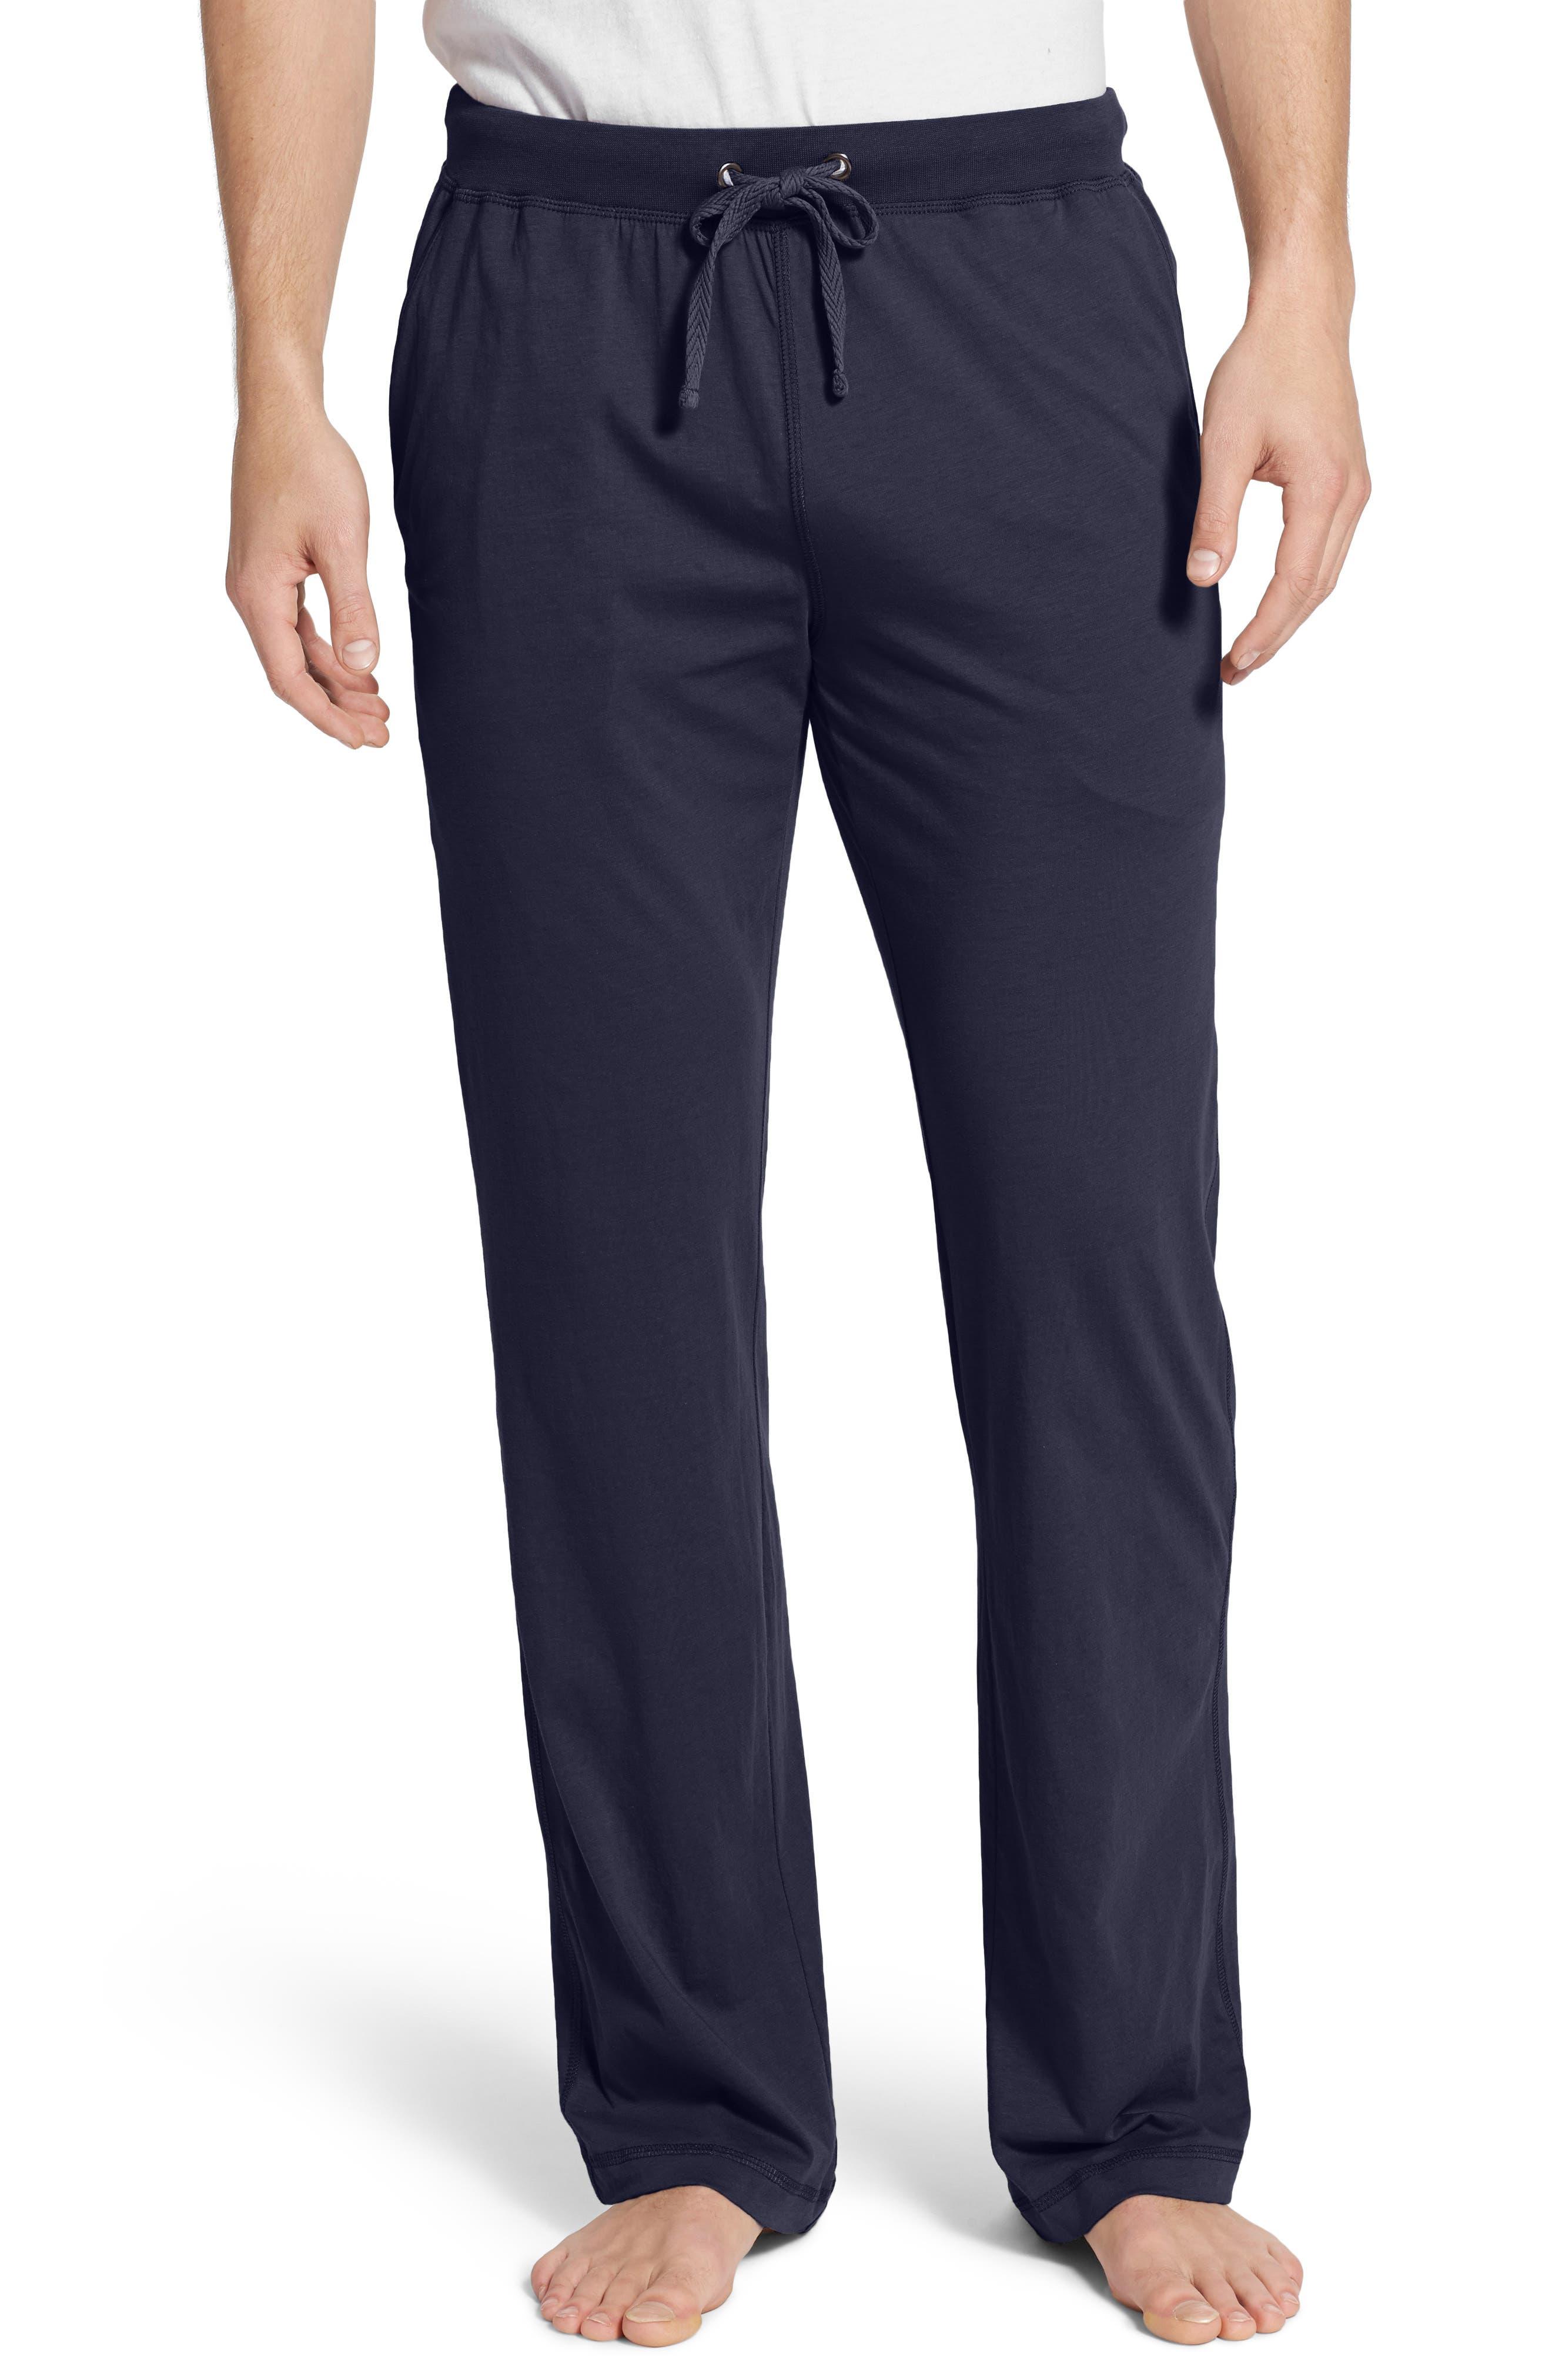 Peruvian Pima Lightweight Cotton Lounge Pants,                         Main,                         color, NAVY